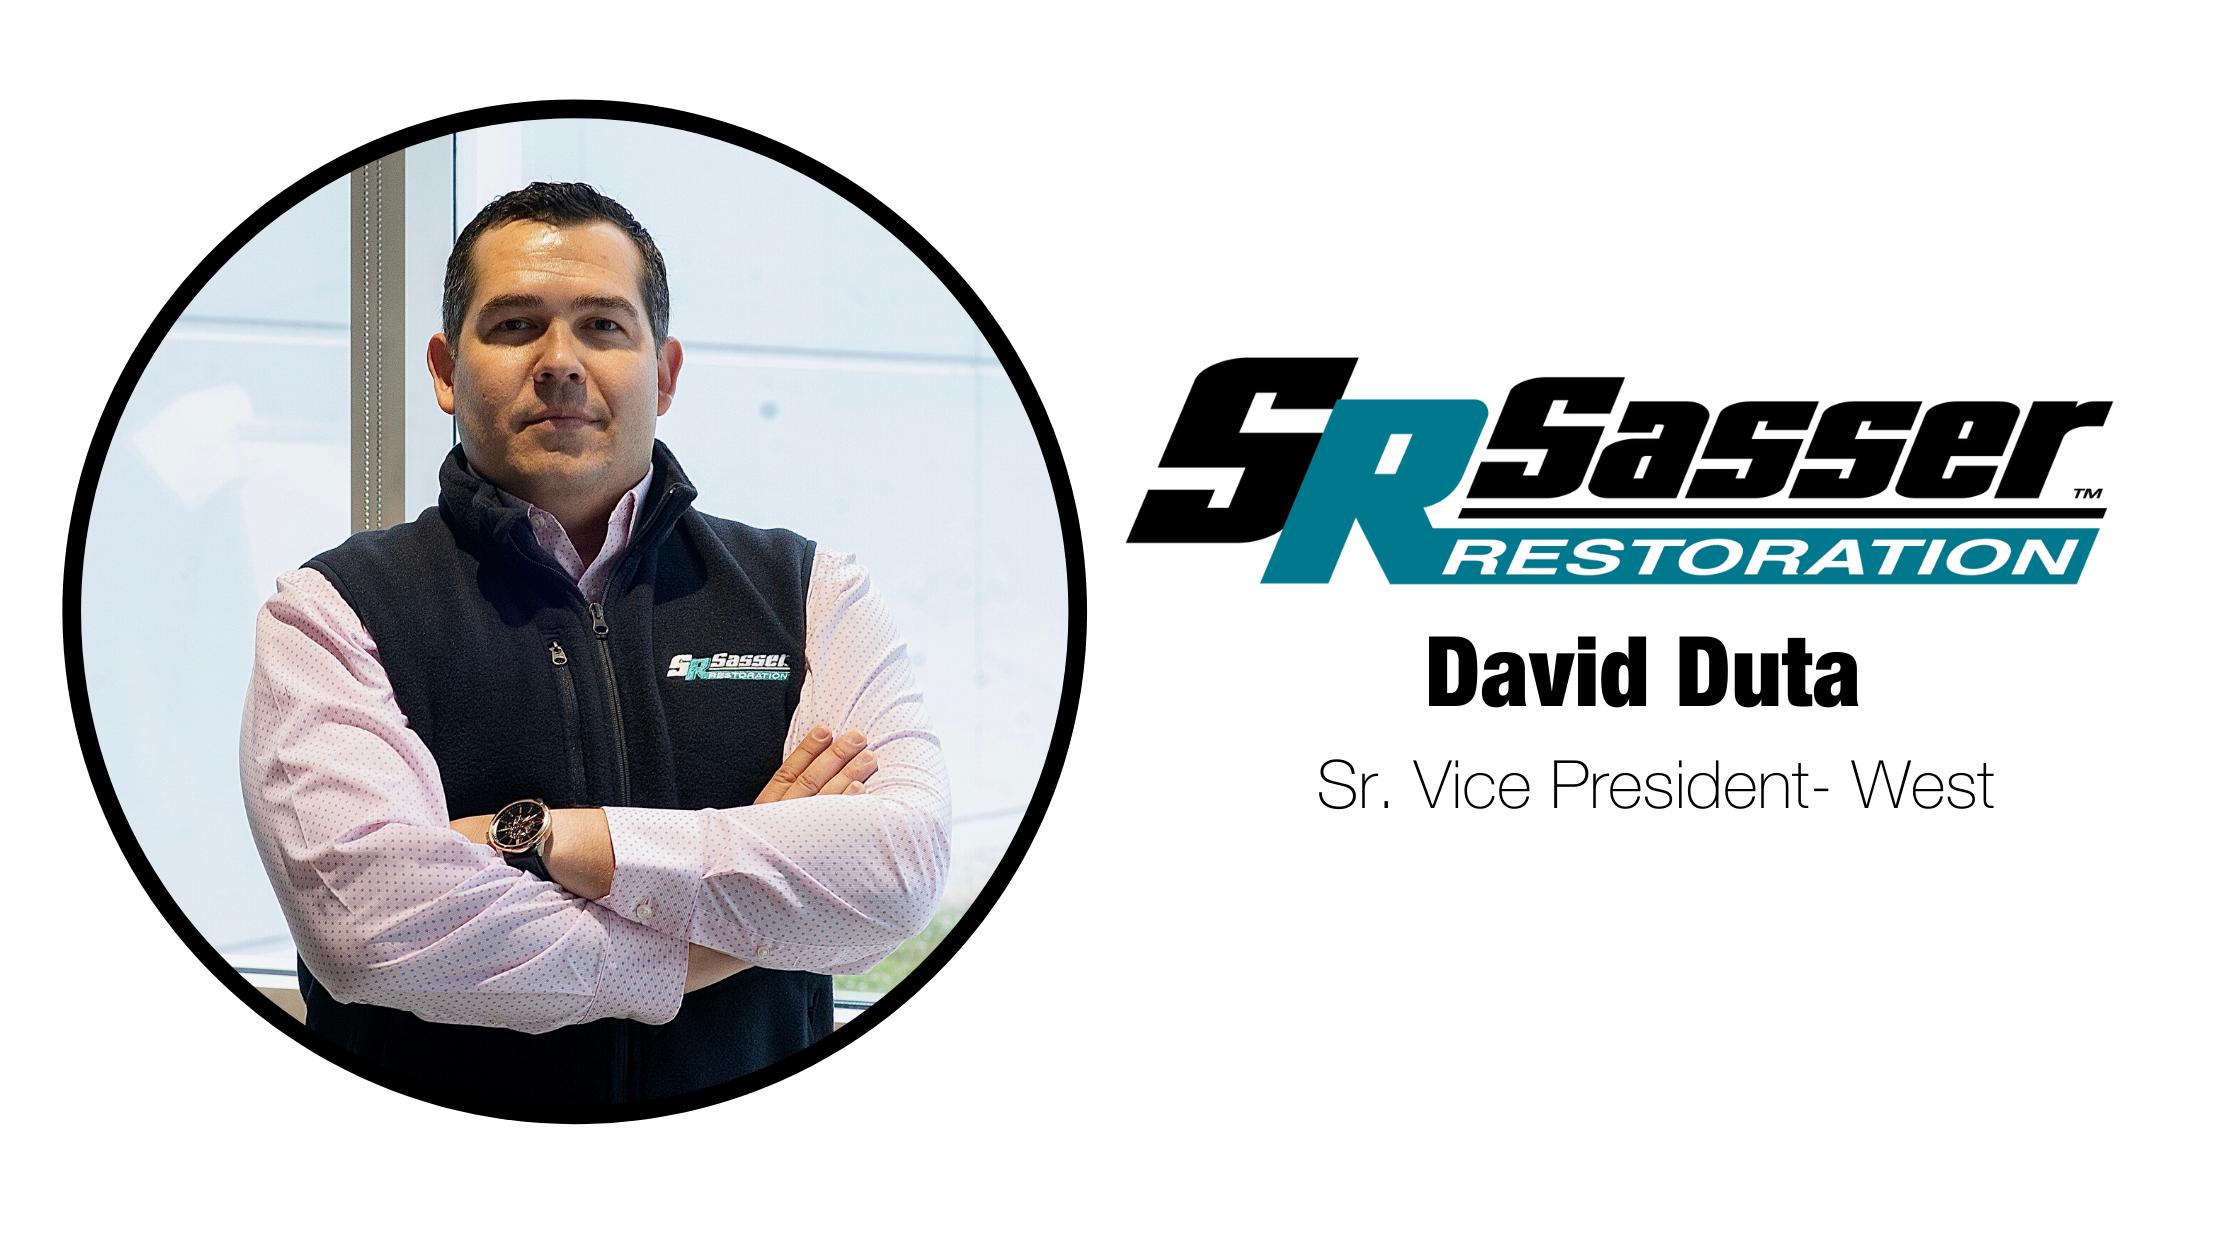 Sasser Restoration Welcomes David Duta as Senior Vice President- West